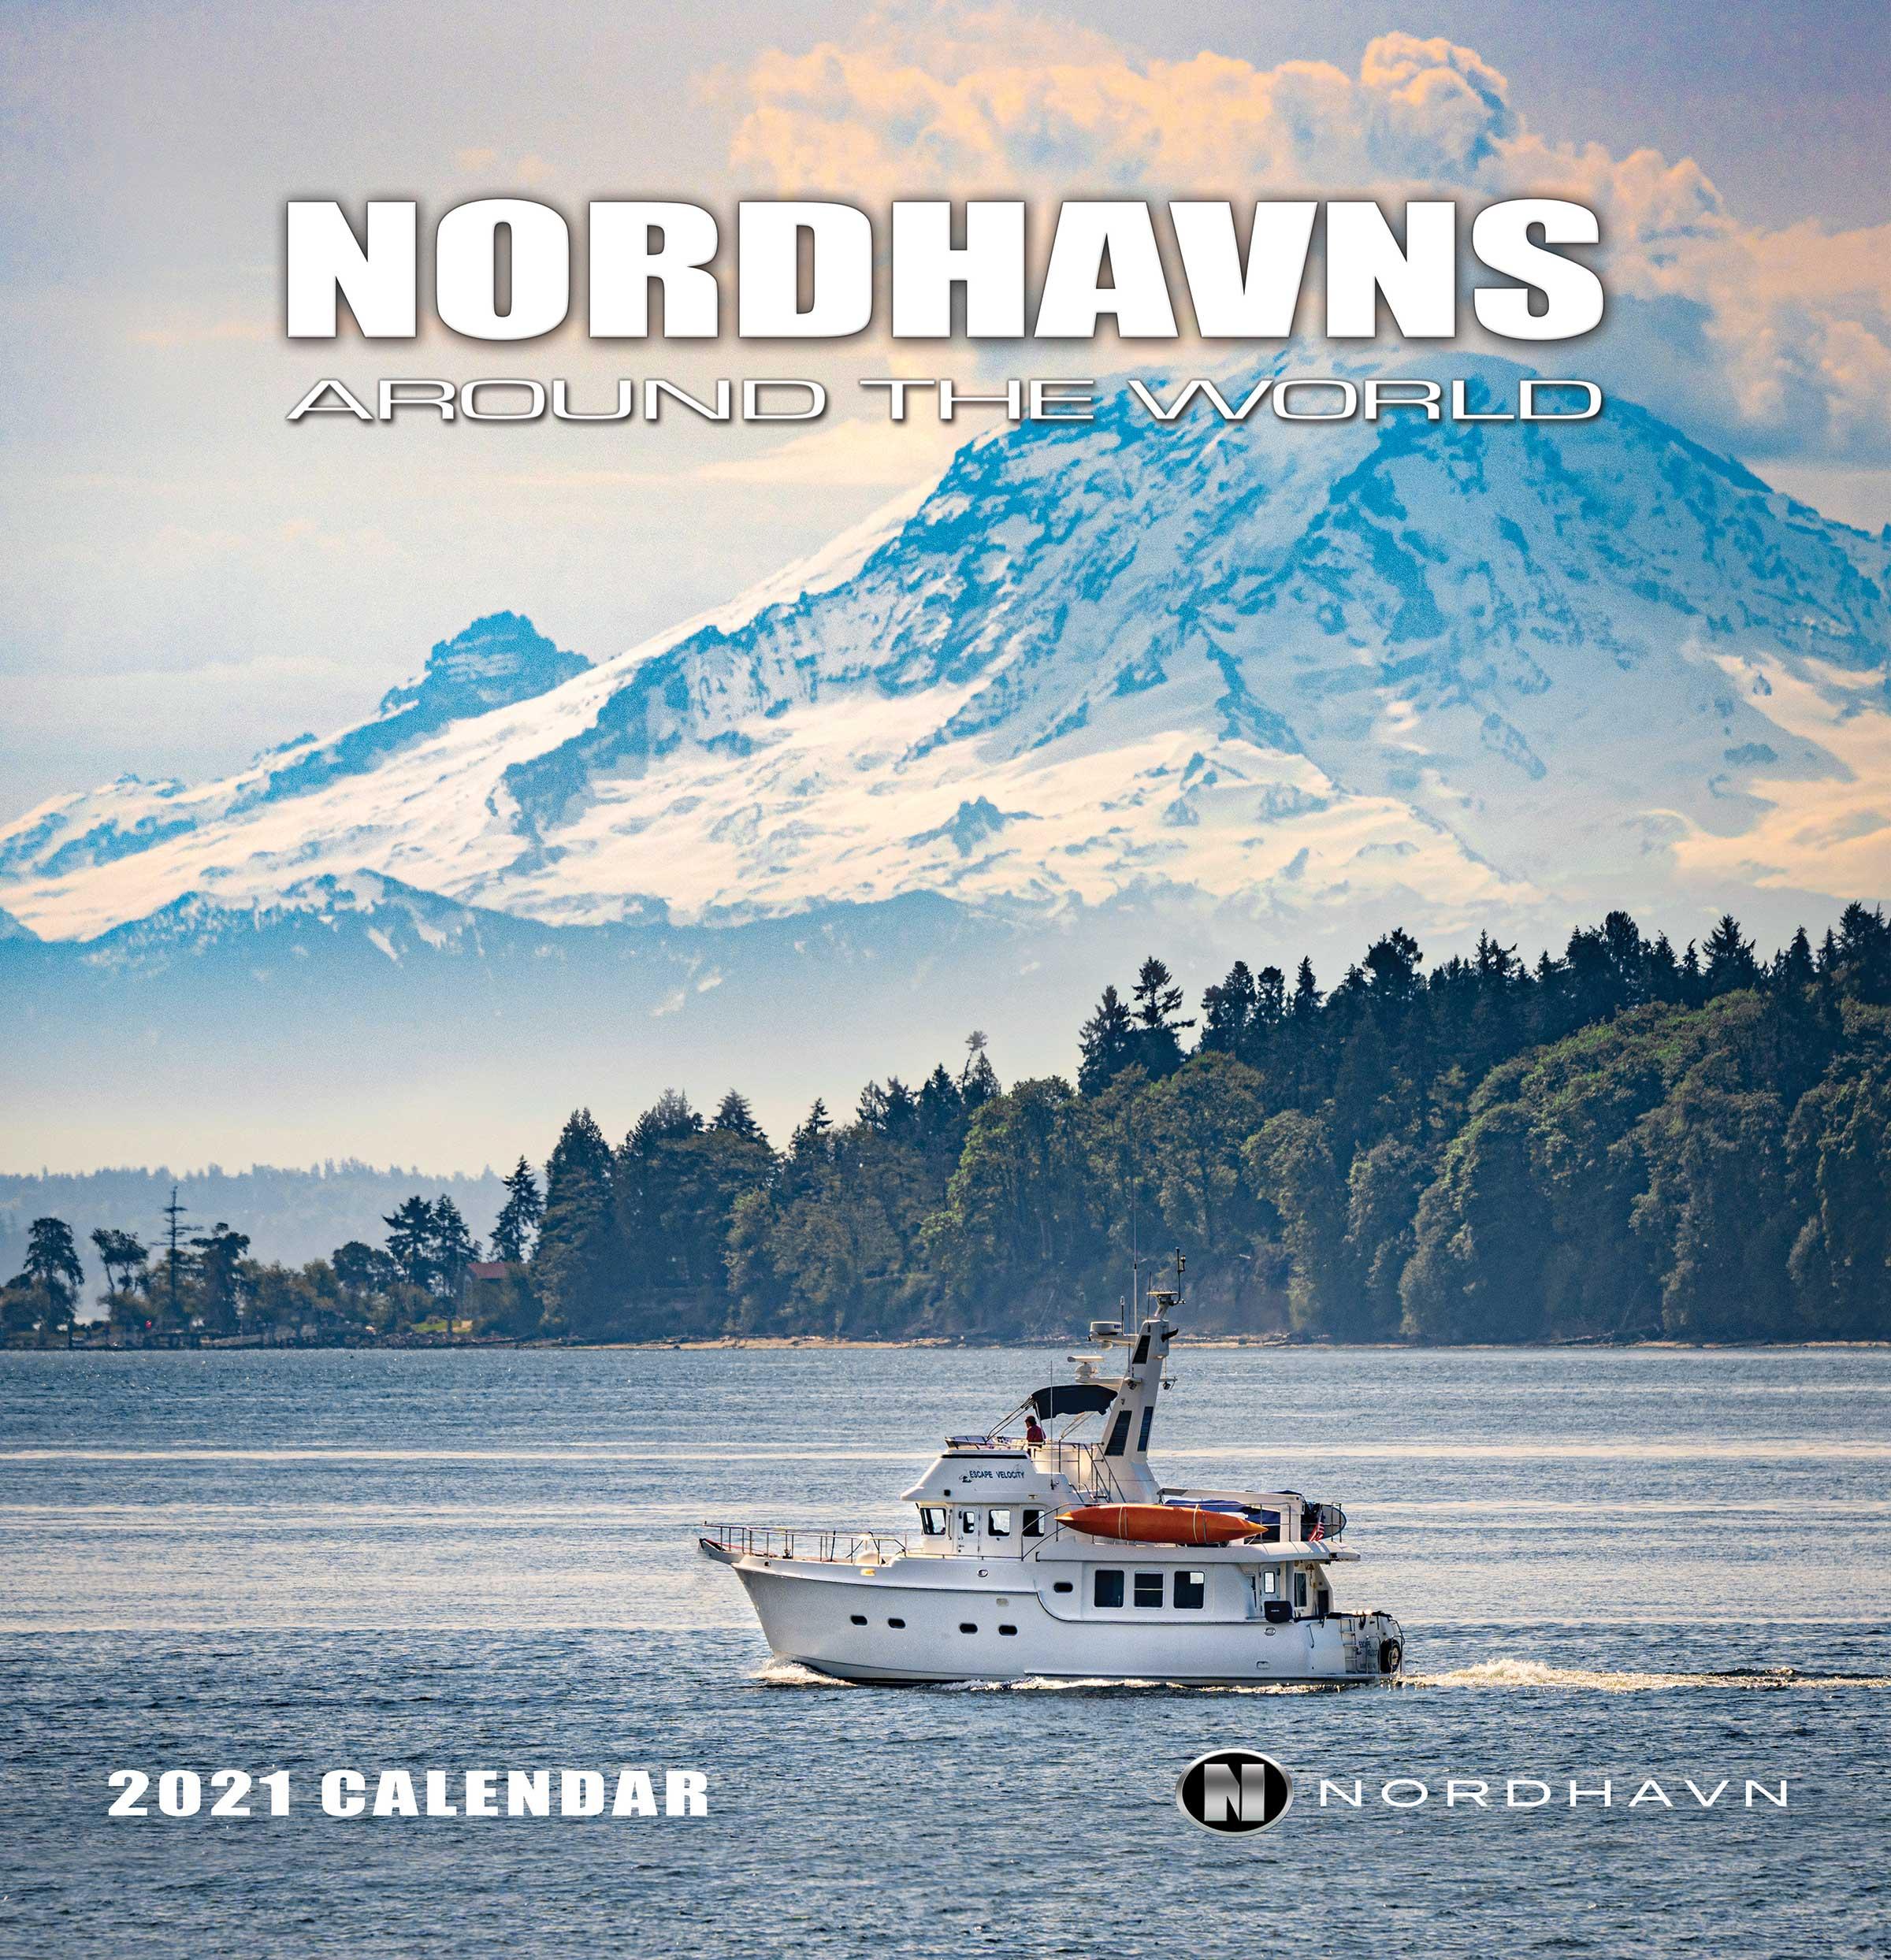 Nordhavn 2021 calendar